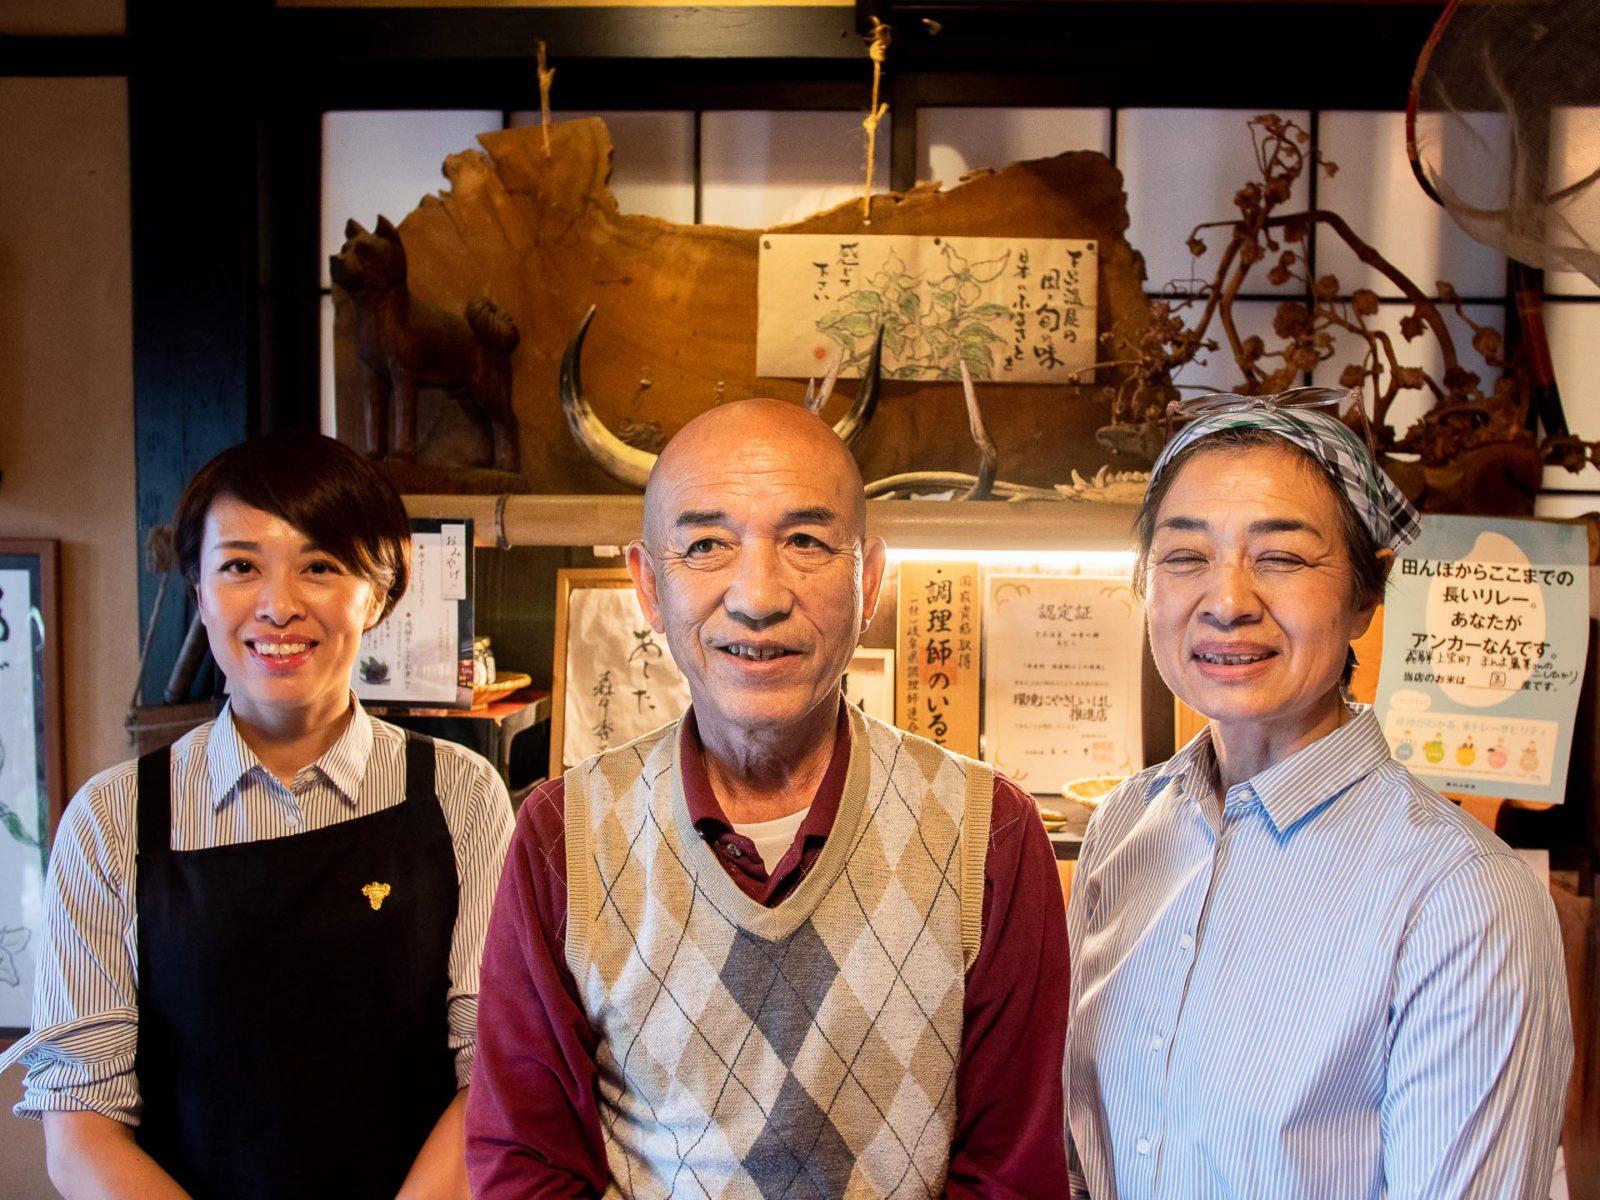 1600941073 177 Visite de Gero Hida Takayama